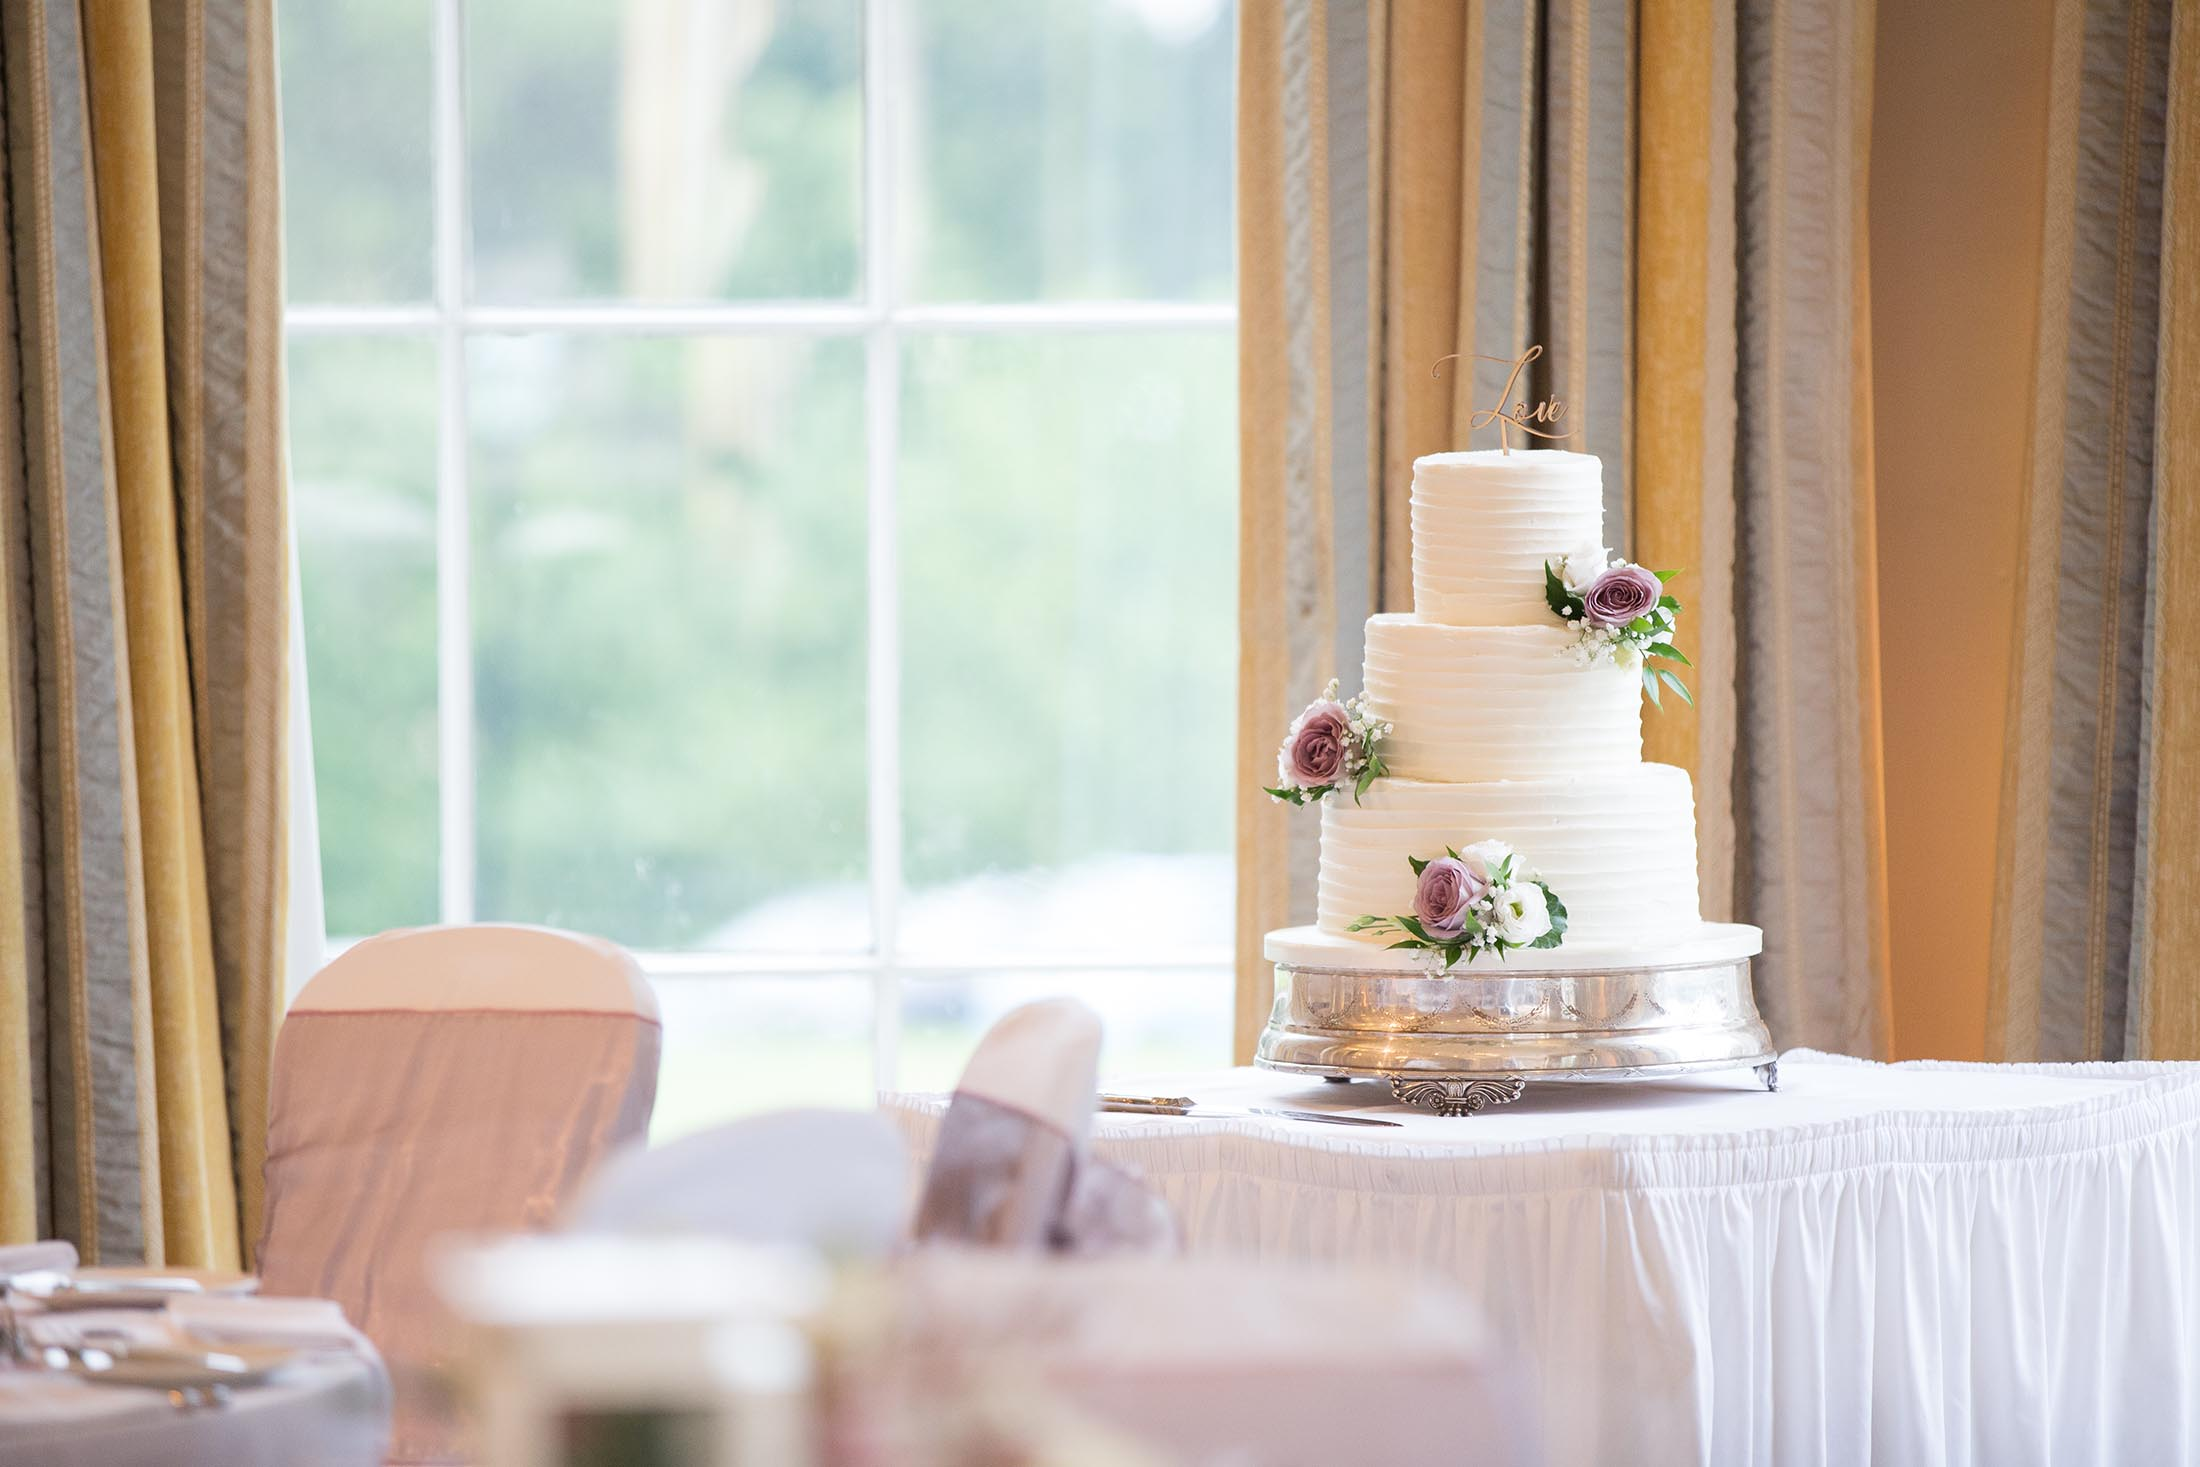 The Wedding Cake at Rudding Park